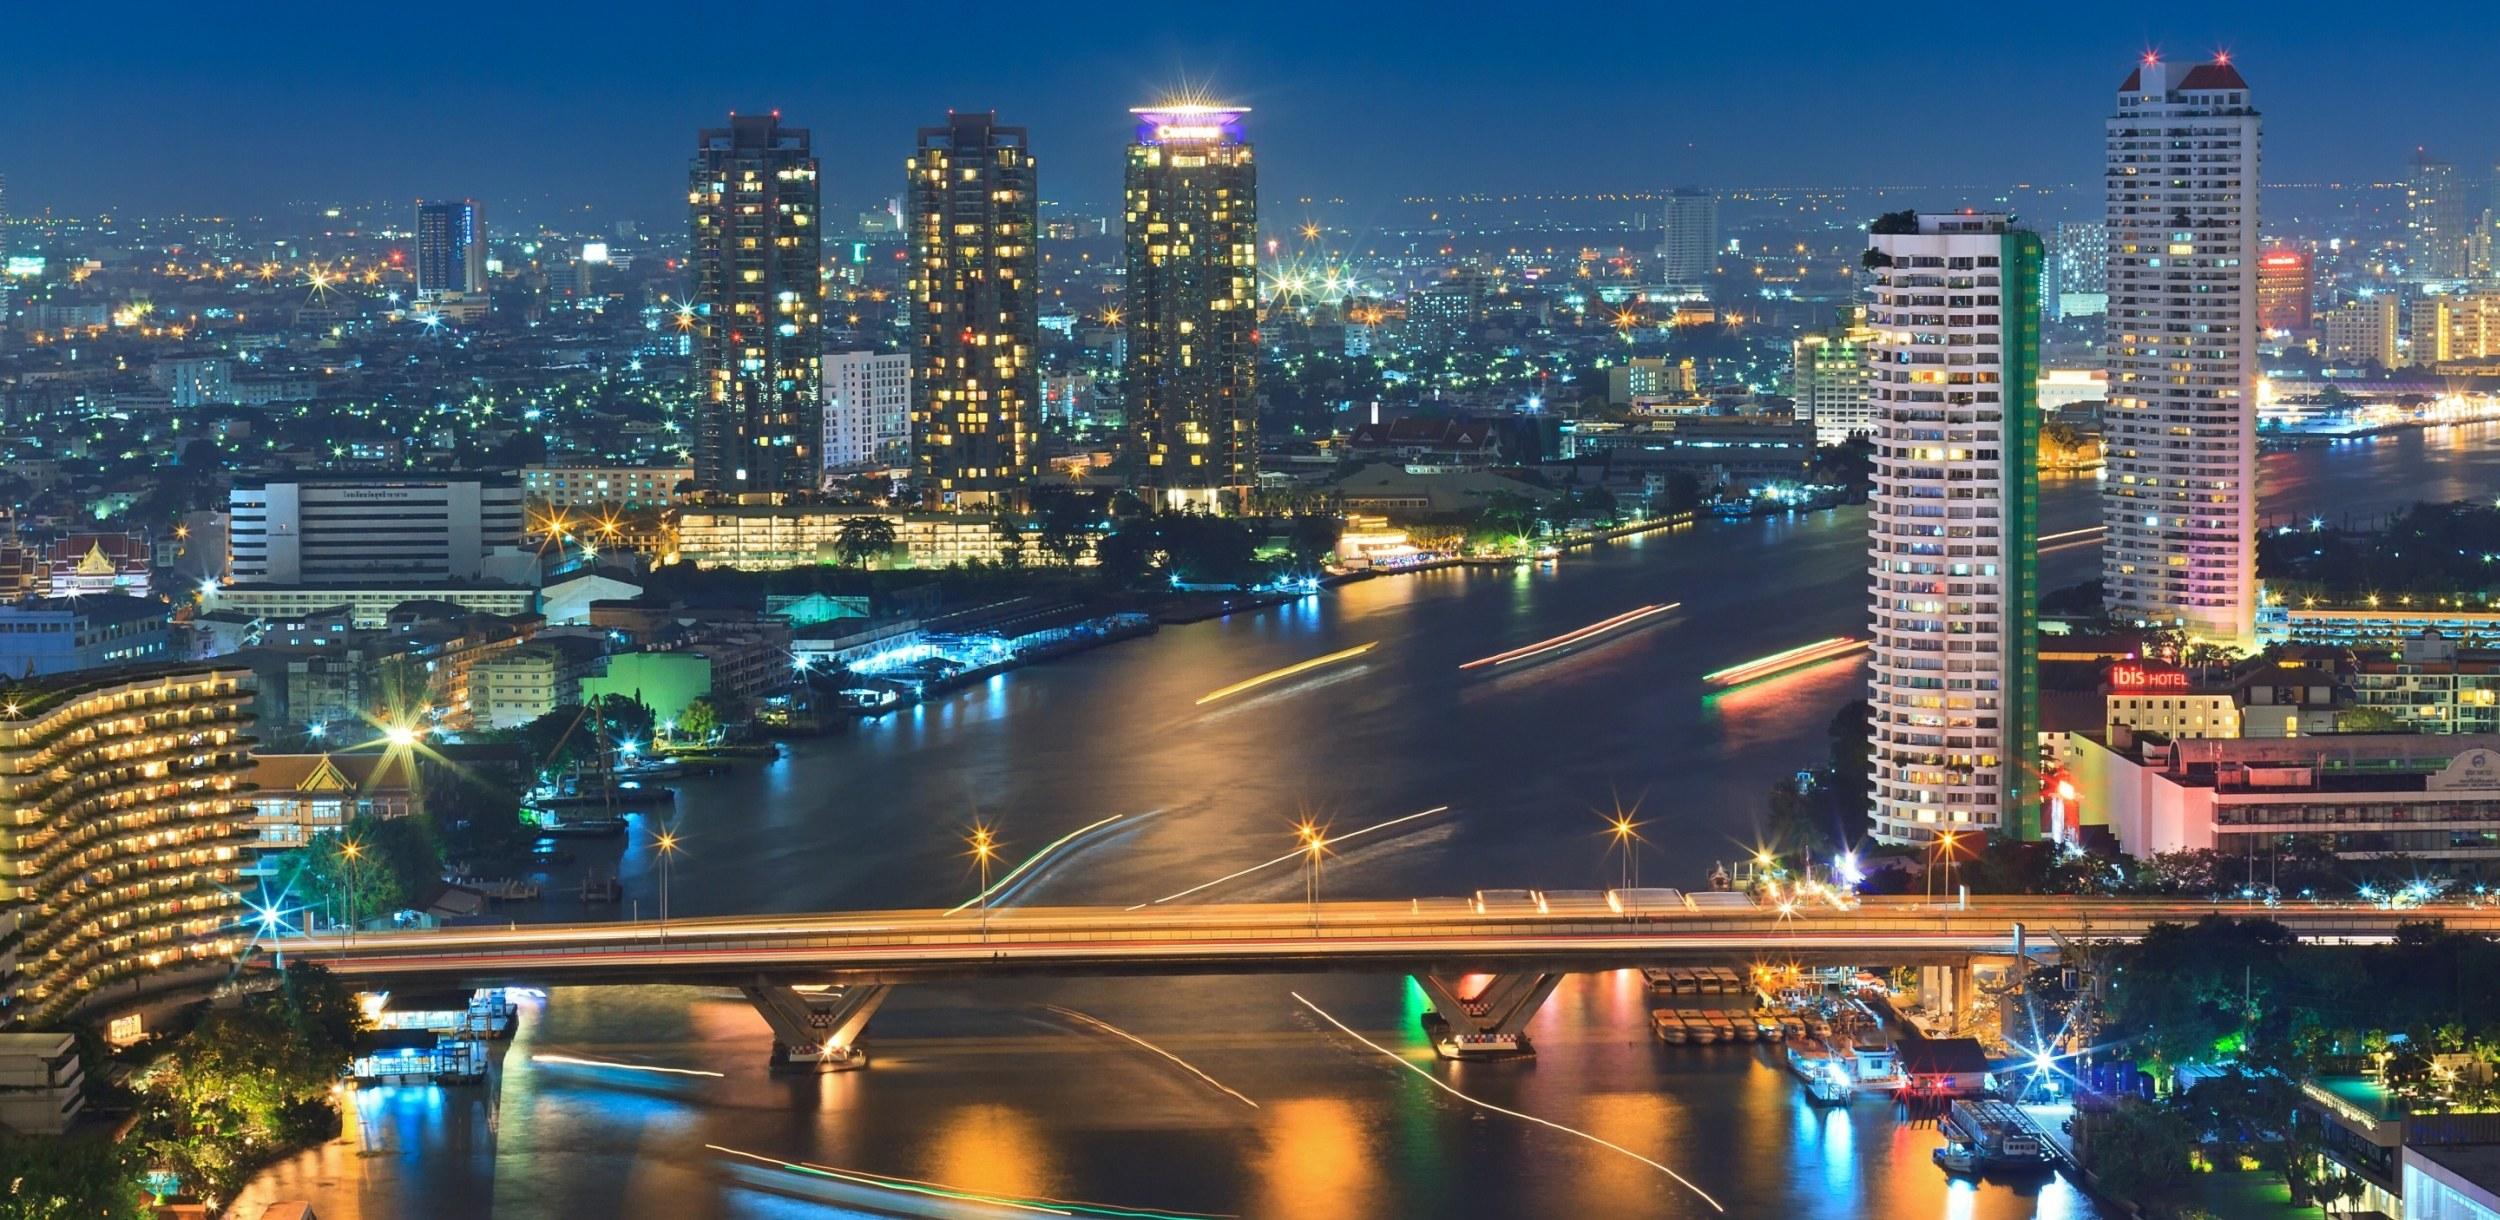 bangkok-thailand-2880x18001